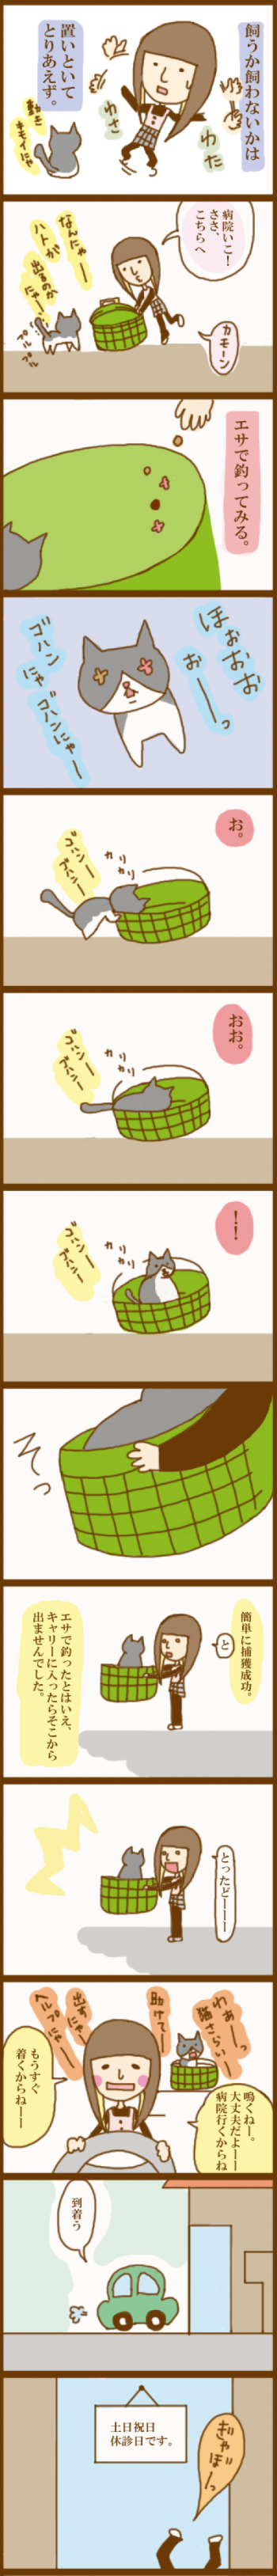 f:id:suzuokayu:20201011195146j:plain